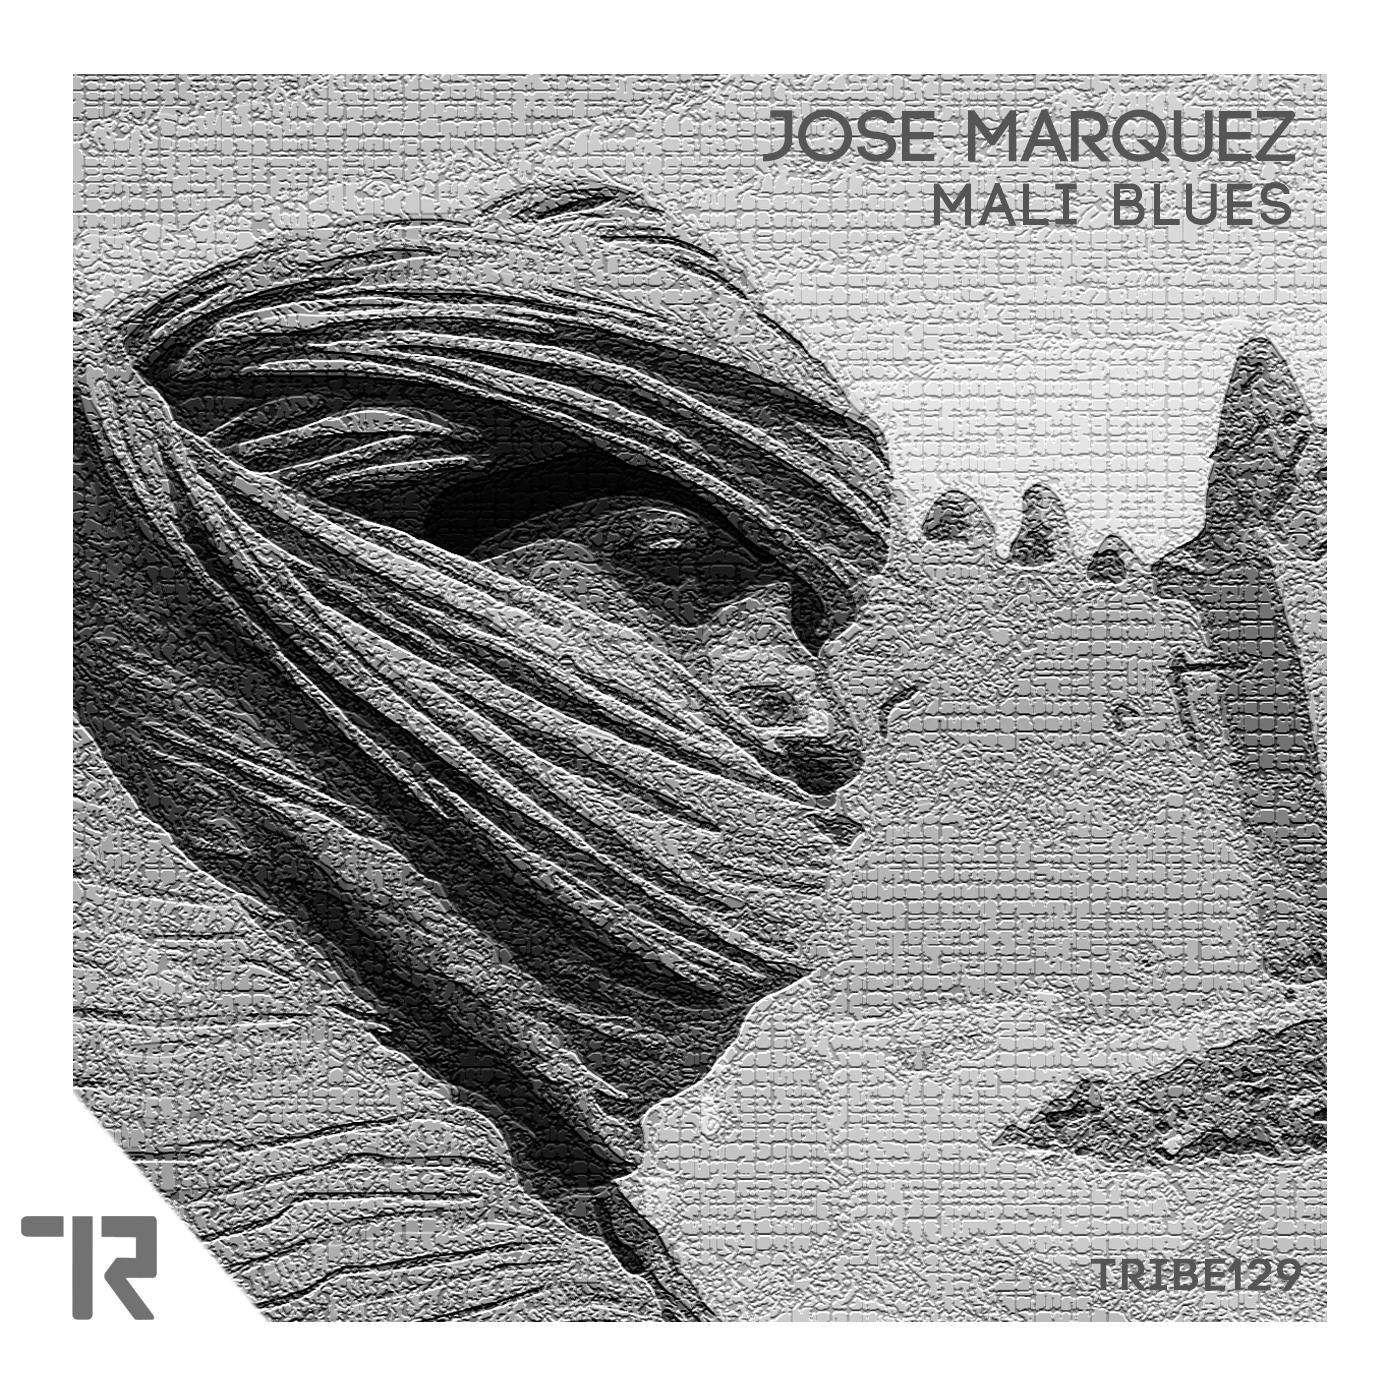 Mali Blues logo cover v3.jpg